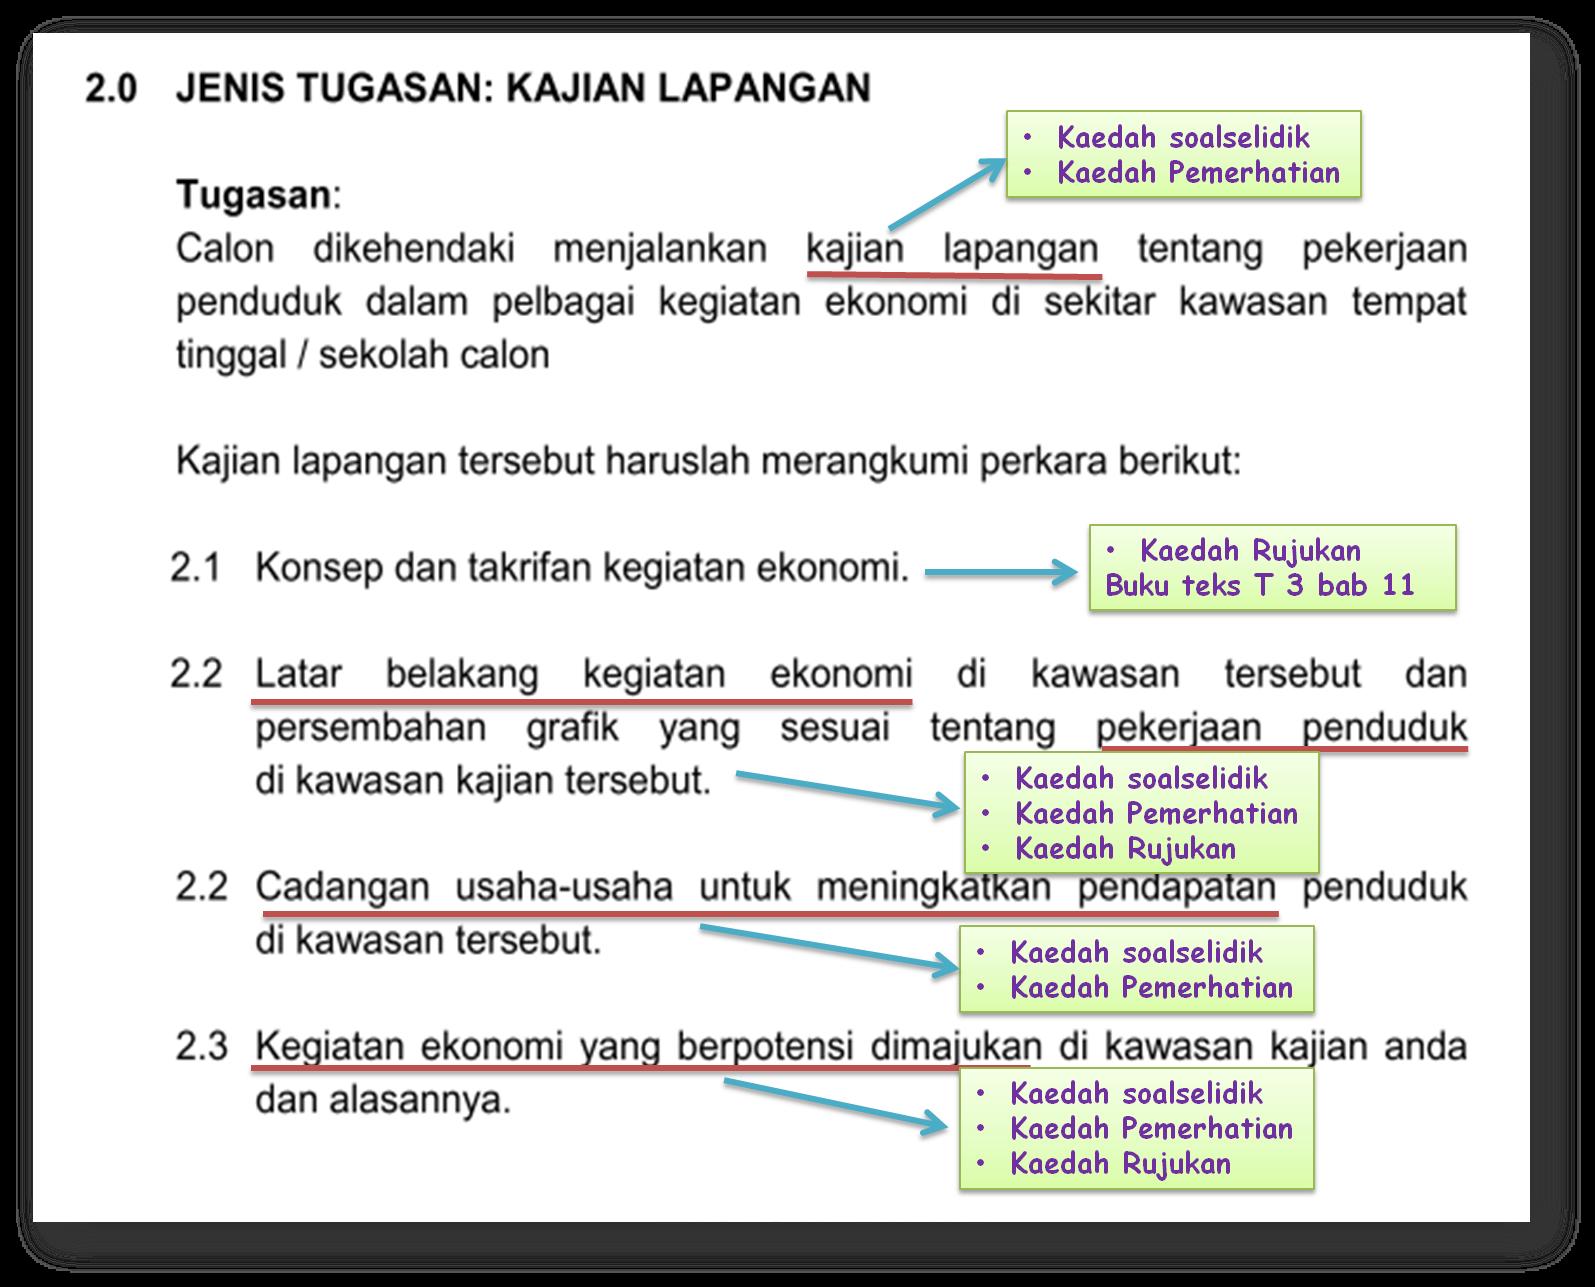 Contoh Soalan Guna Tanah Geografi Pt3 2018 Soalan Bl